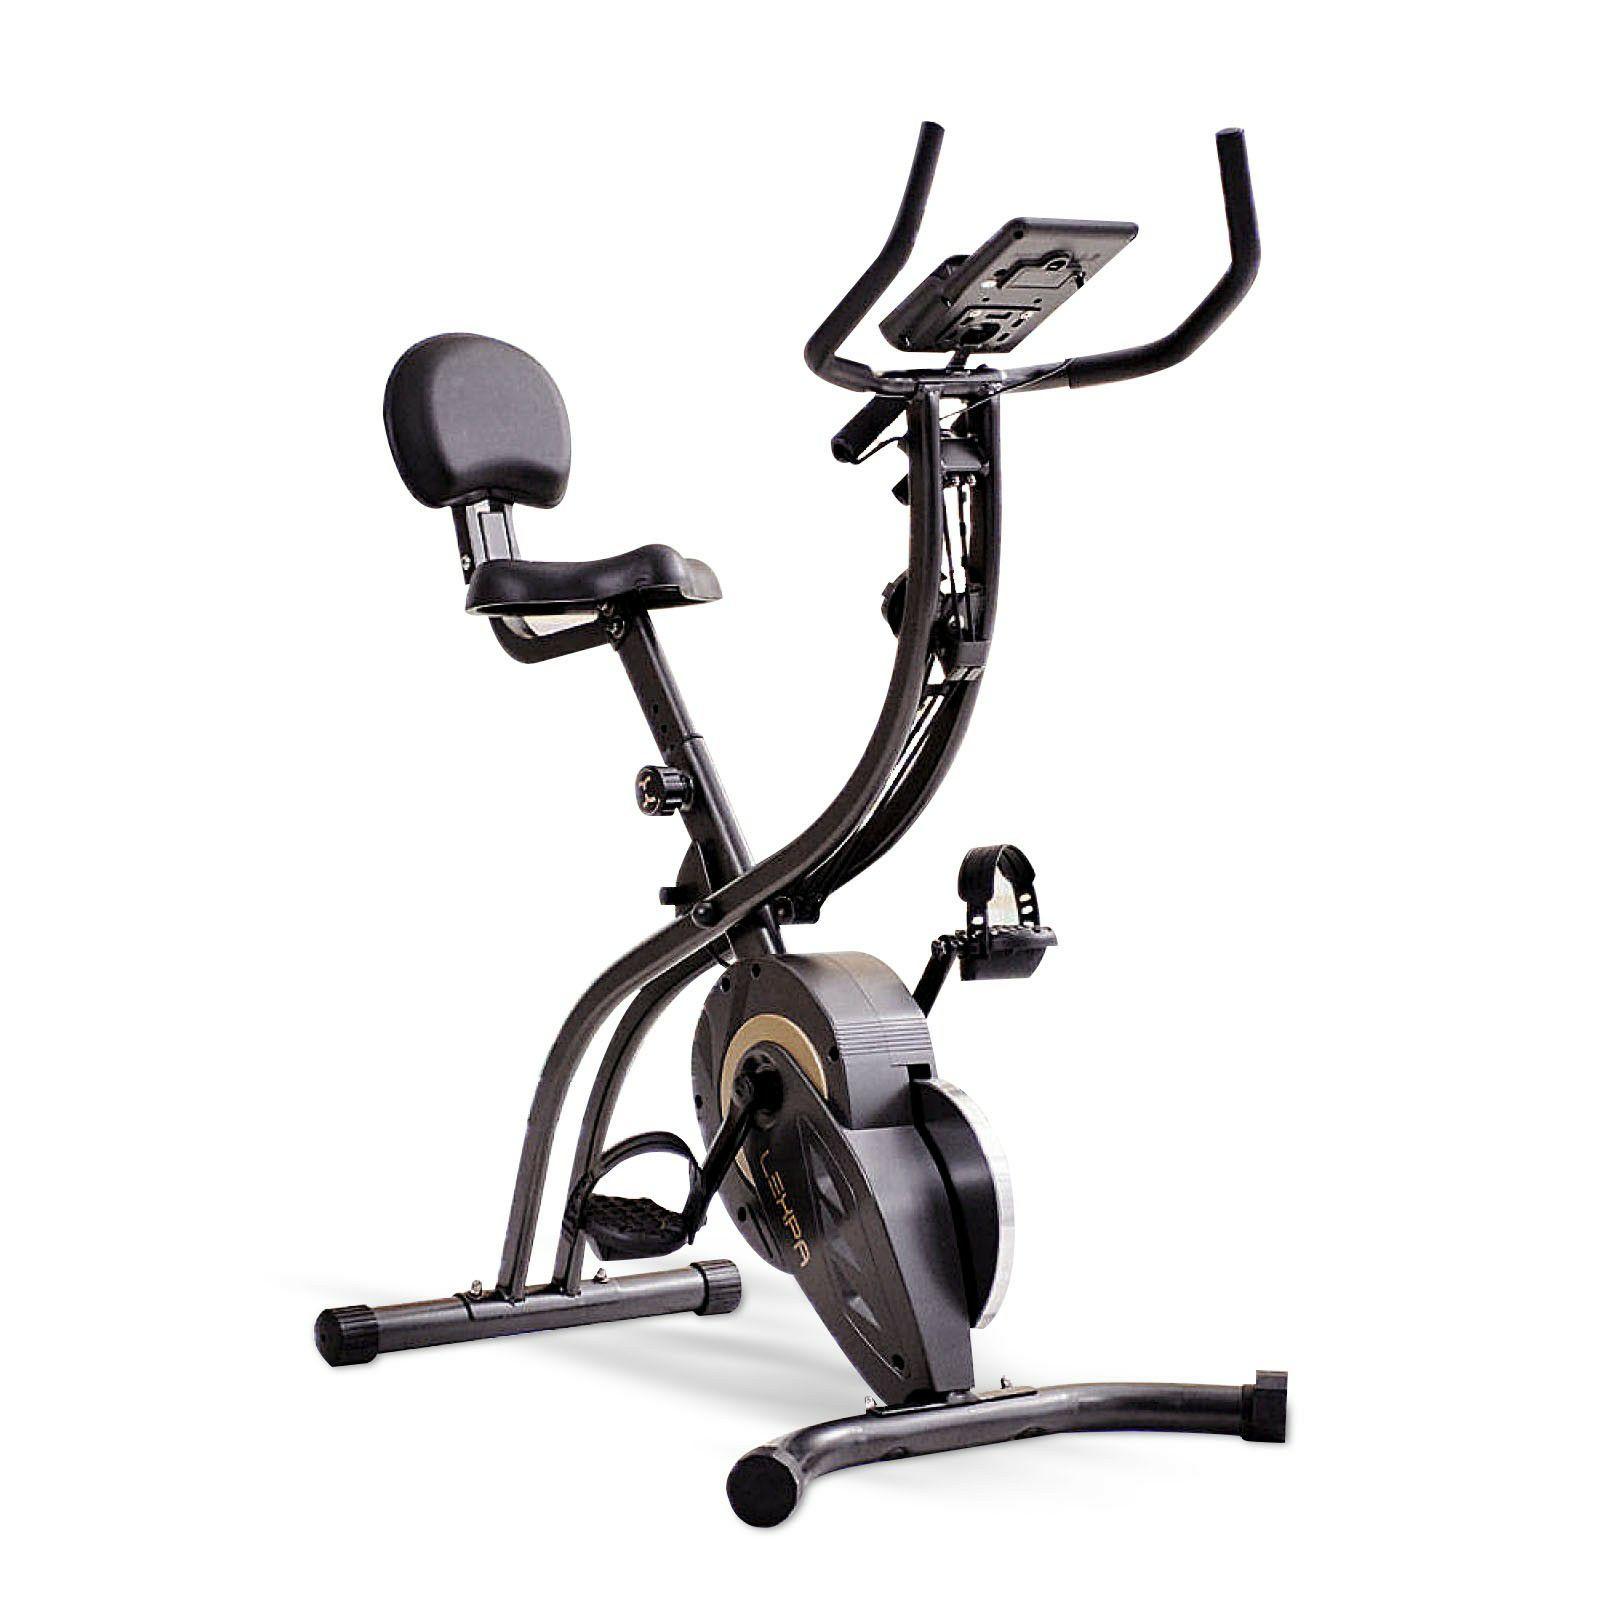 Lexpa YA-430 Folding Upright Exercise Bike £149 + £9.99 delivery @ Powerhouse fitness